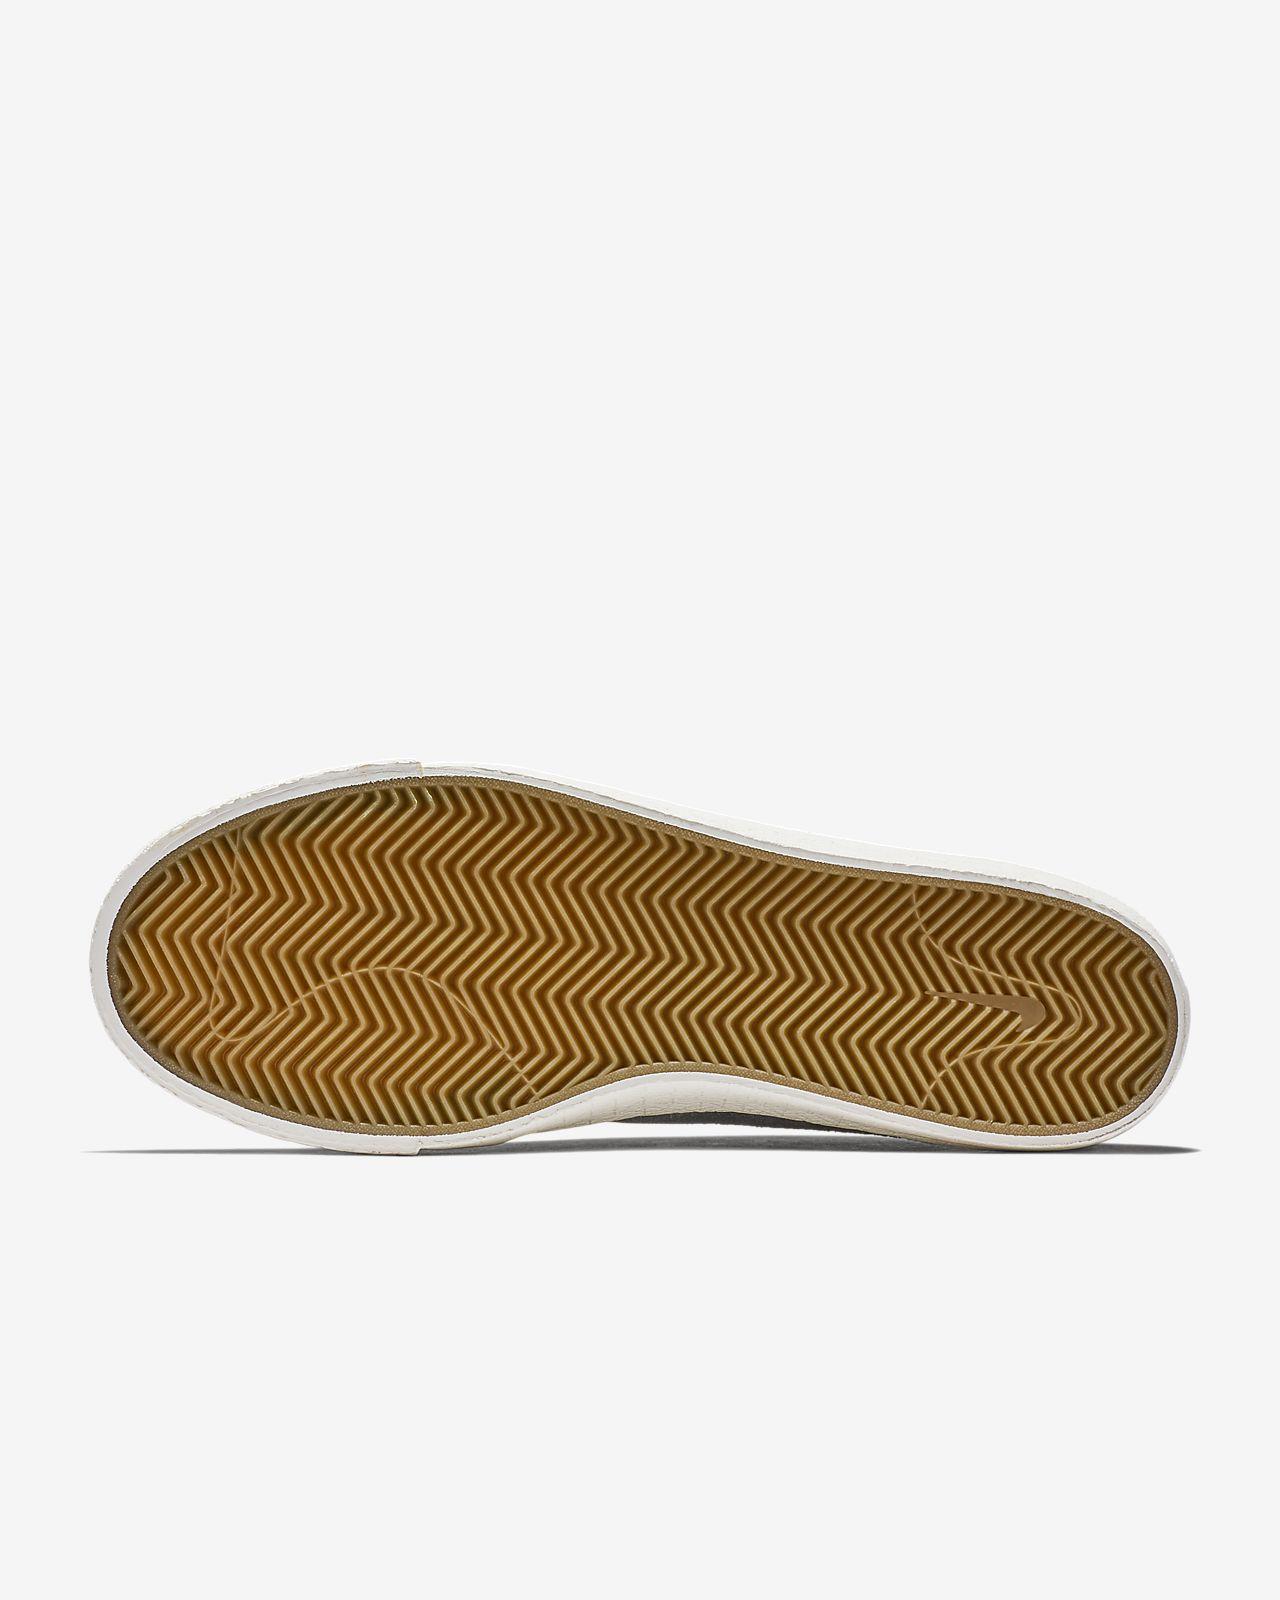 quality design b4590 f6bc1 ... Nike SB Zoom Blazer Chukka XT-skatersko til mænd